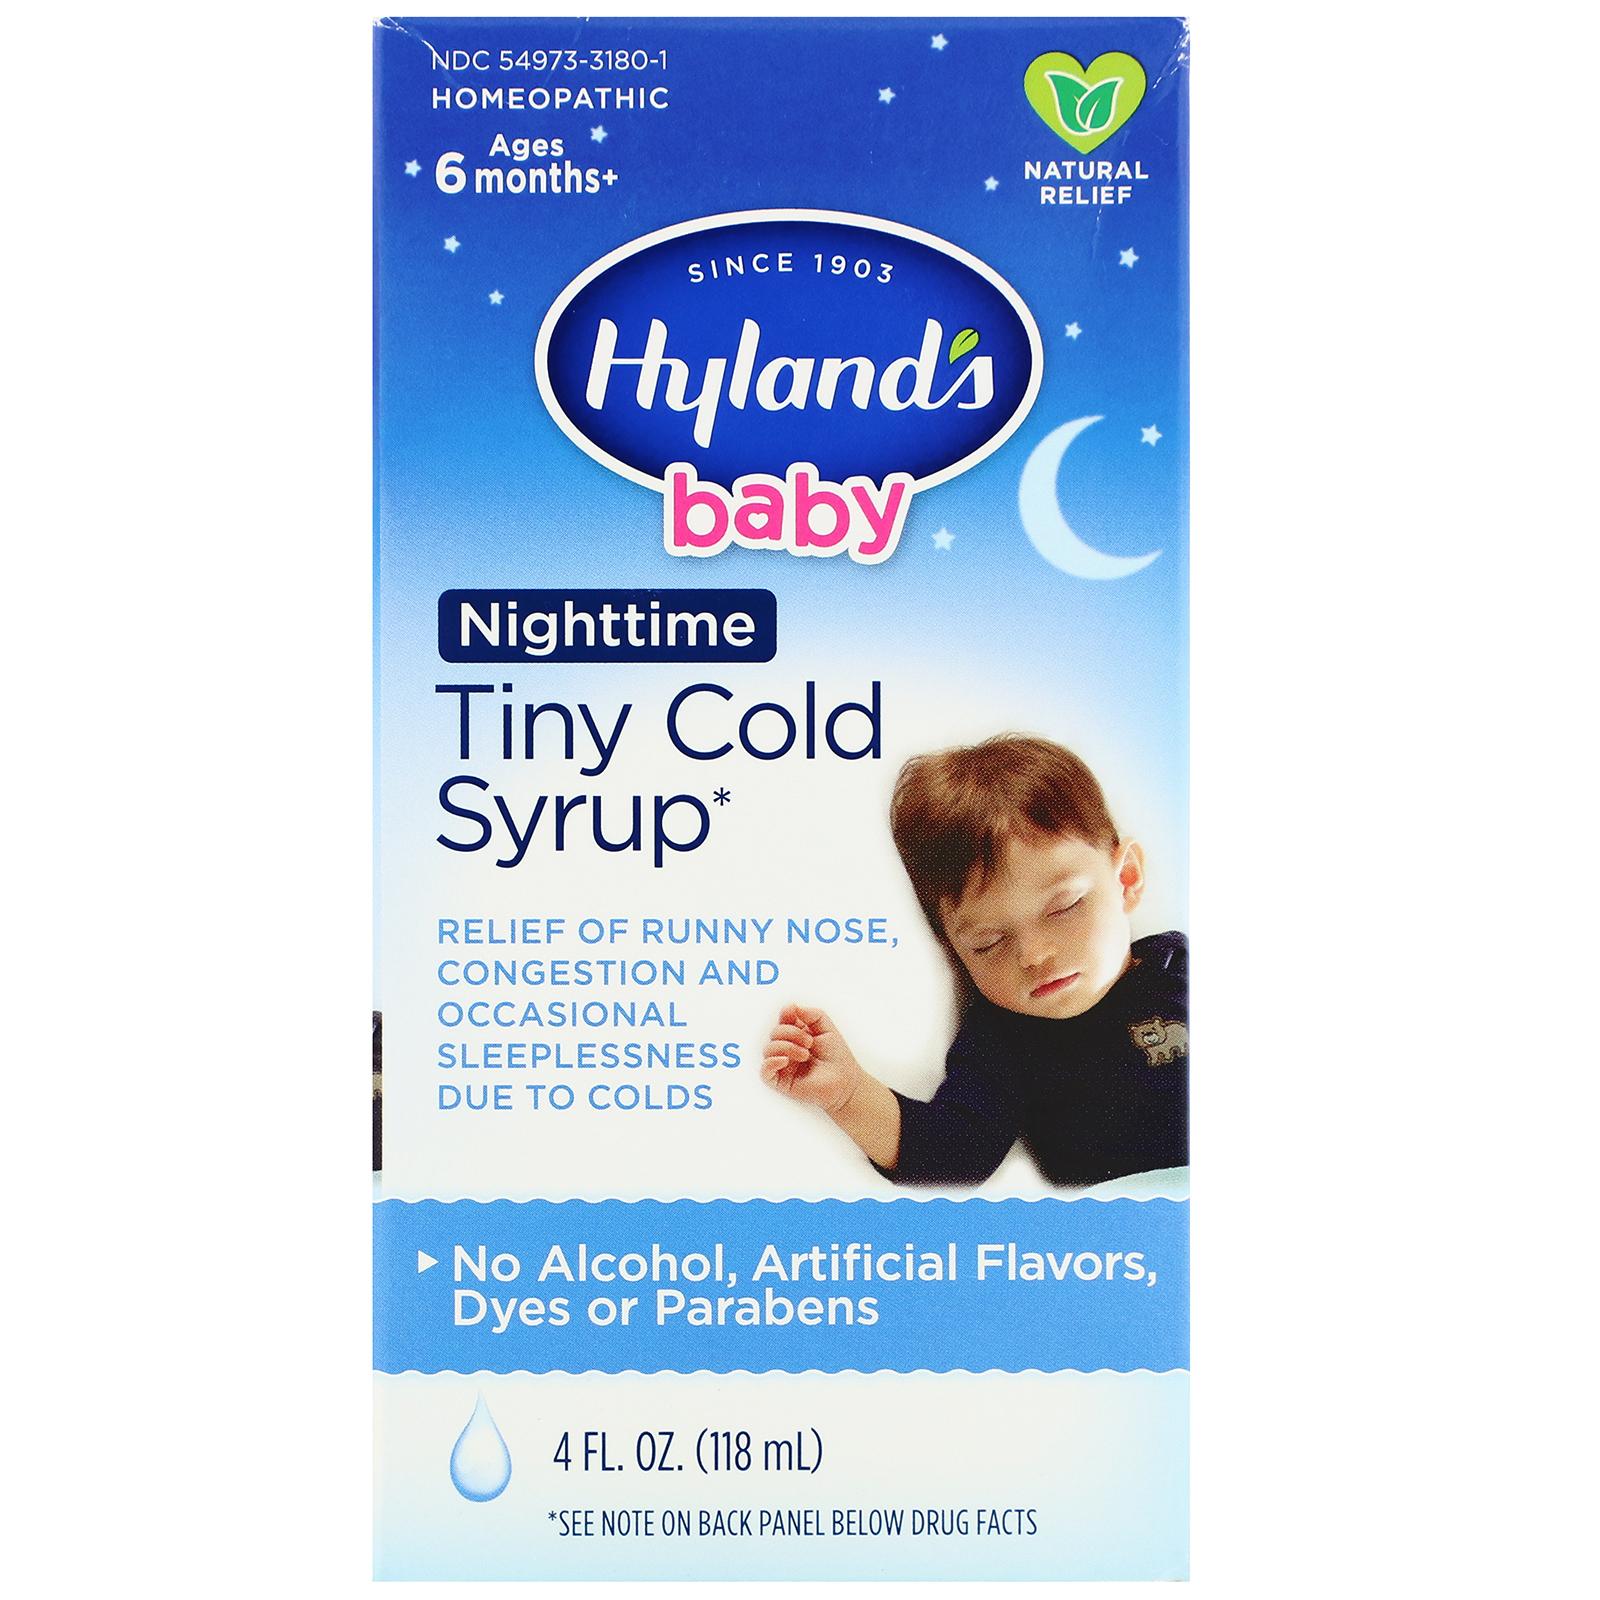 Hyland s Baby Nighttime Tiny Cold Syrup 4 fl oz 118 ml No ...